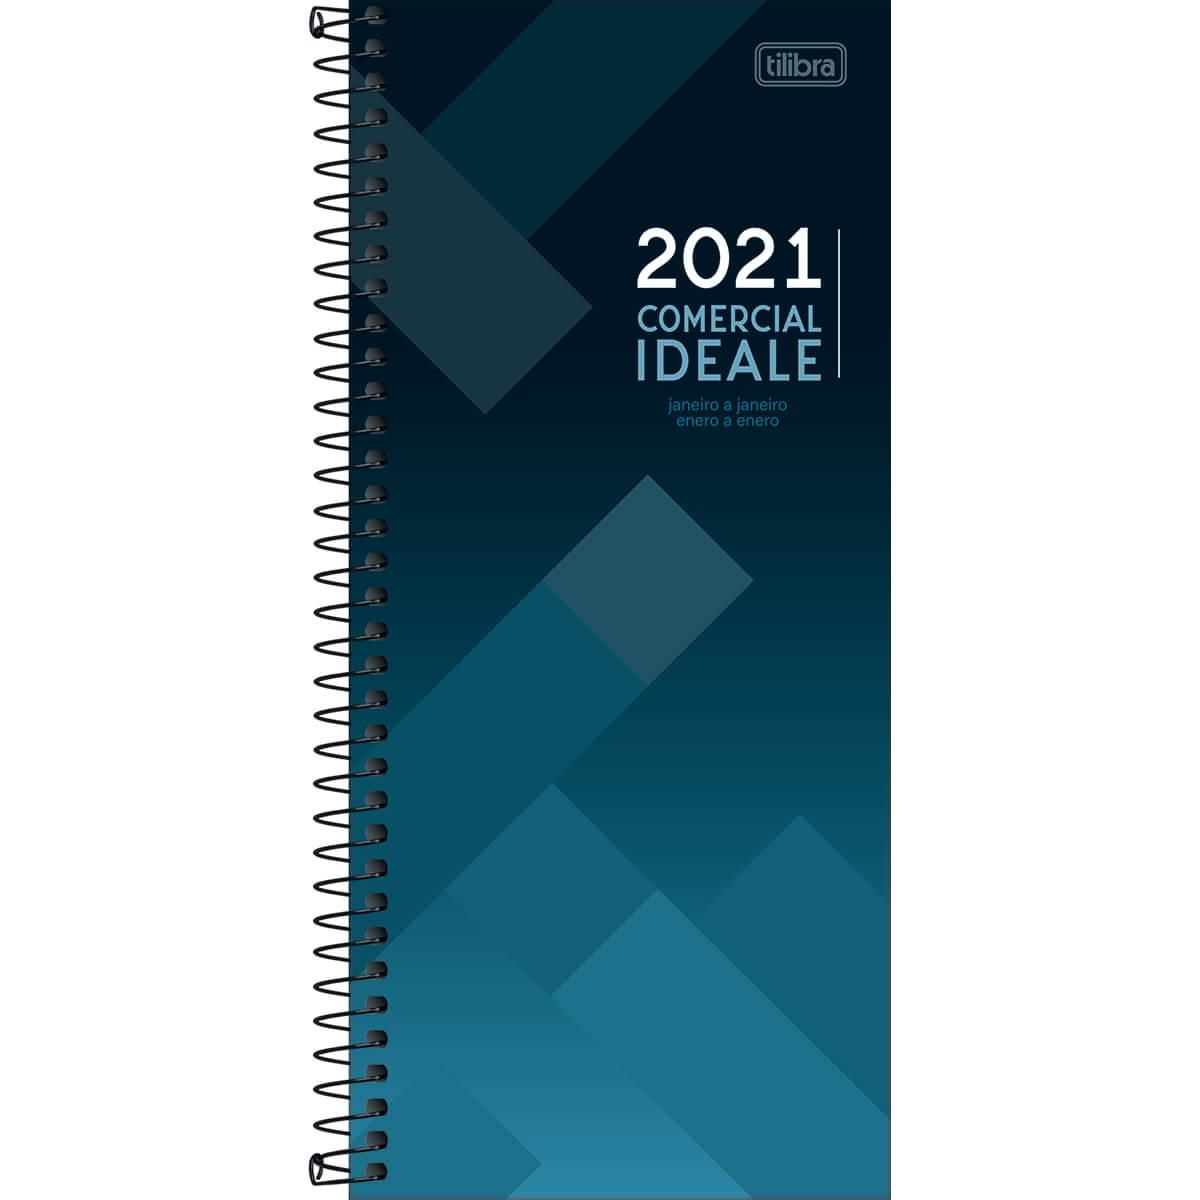 Agenda comercial 2021 espiral 208 fls Ideale M8 Tilibra